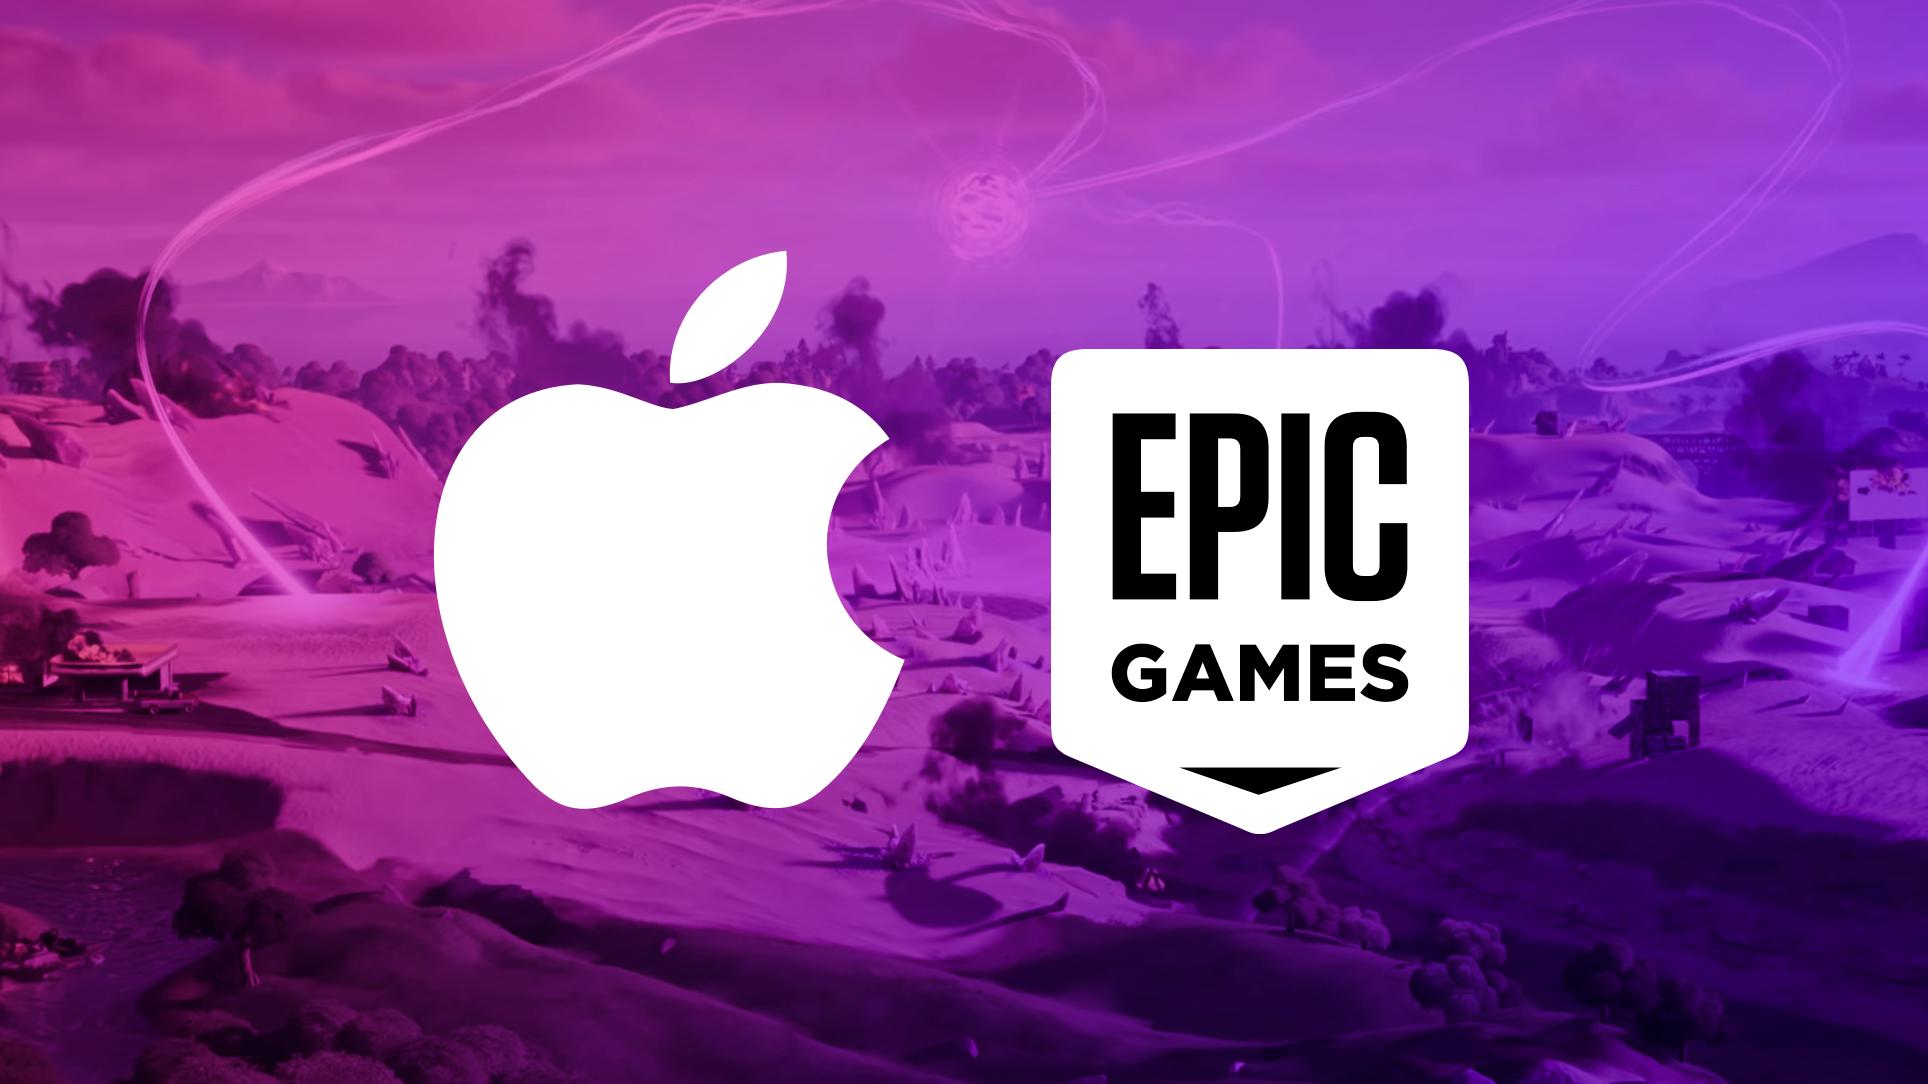 Epic V Apple Trial Wrap-Up: Judge Makes Landmark Decision In Massive Tech  Case - GameSpot